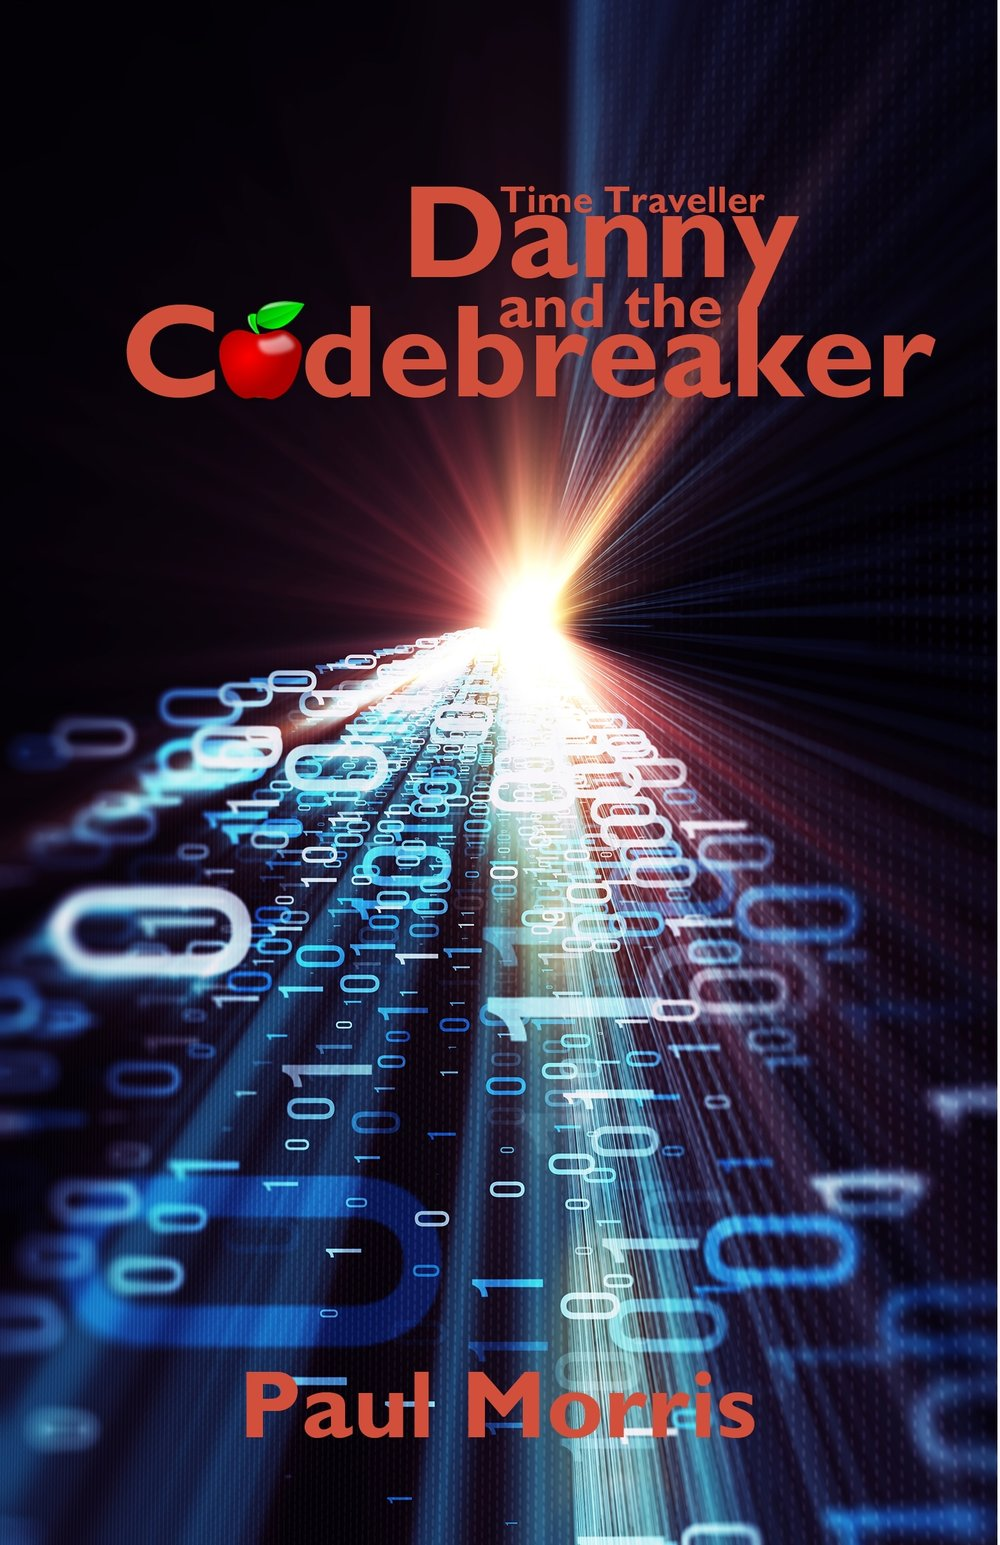 TTDannyAndTheCodebreaker_Hardback4 again.JPG